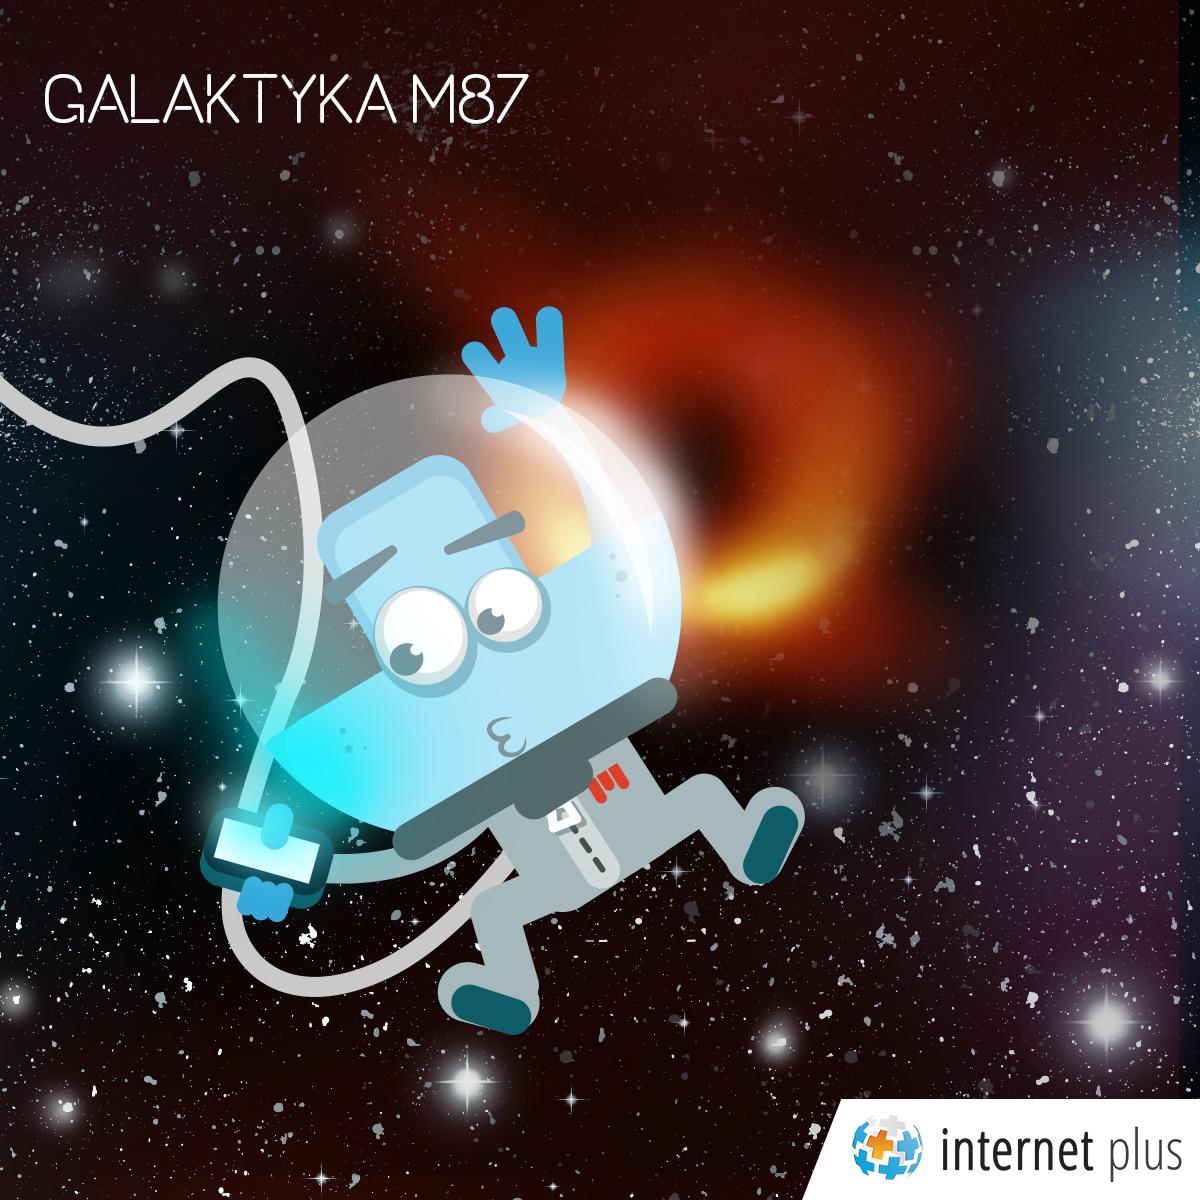 Real-time marketing wwydaniu Internet Plus.